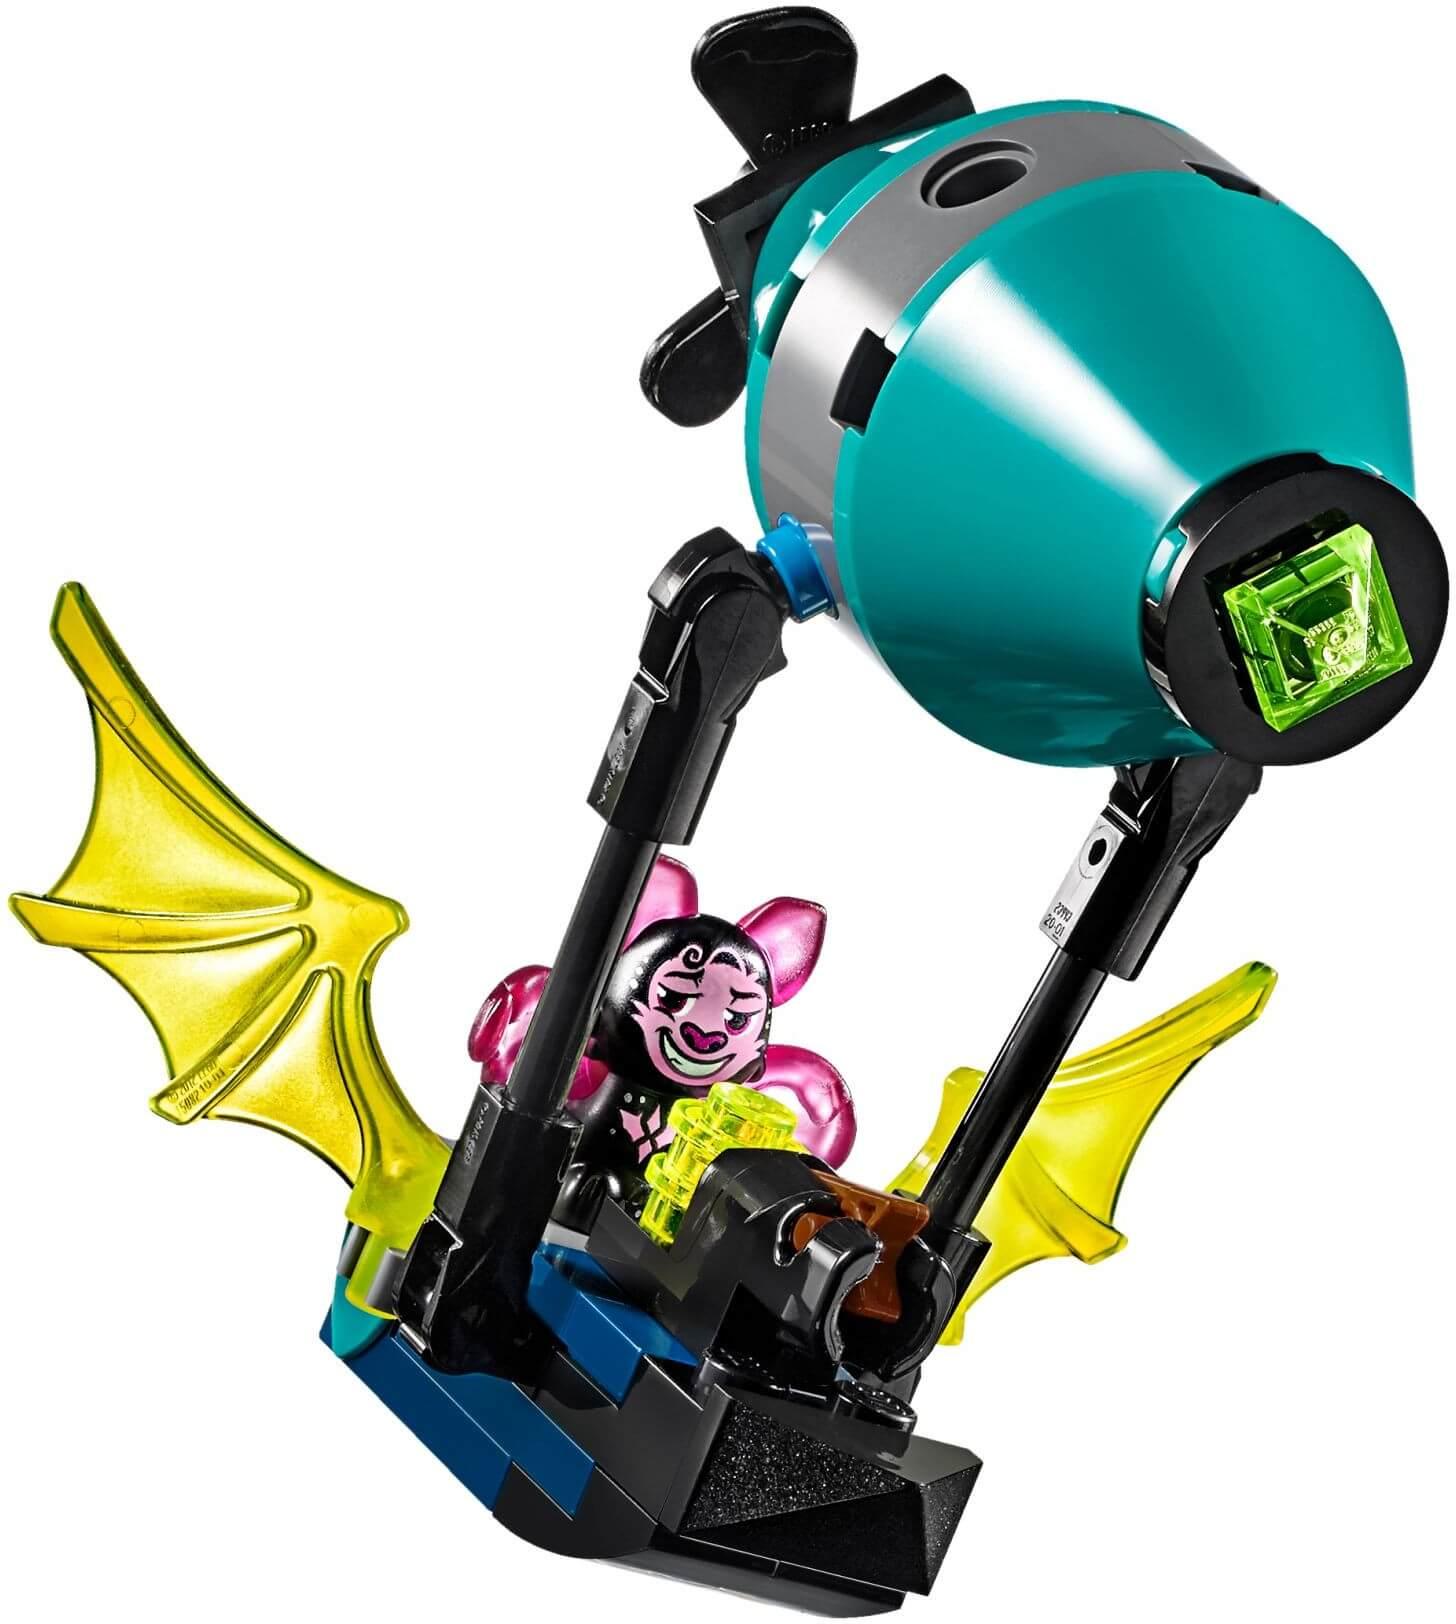 Mua đồ chơi LEGO 41193 - LEGO Elves 41193 - Rồng Gió của Aira (LEGO Elves 41193 Aira & the Song of the Wind Dragon)